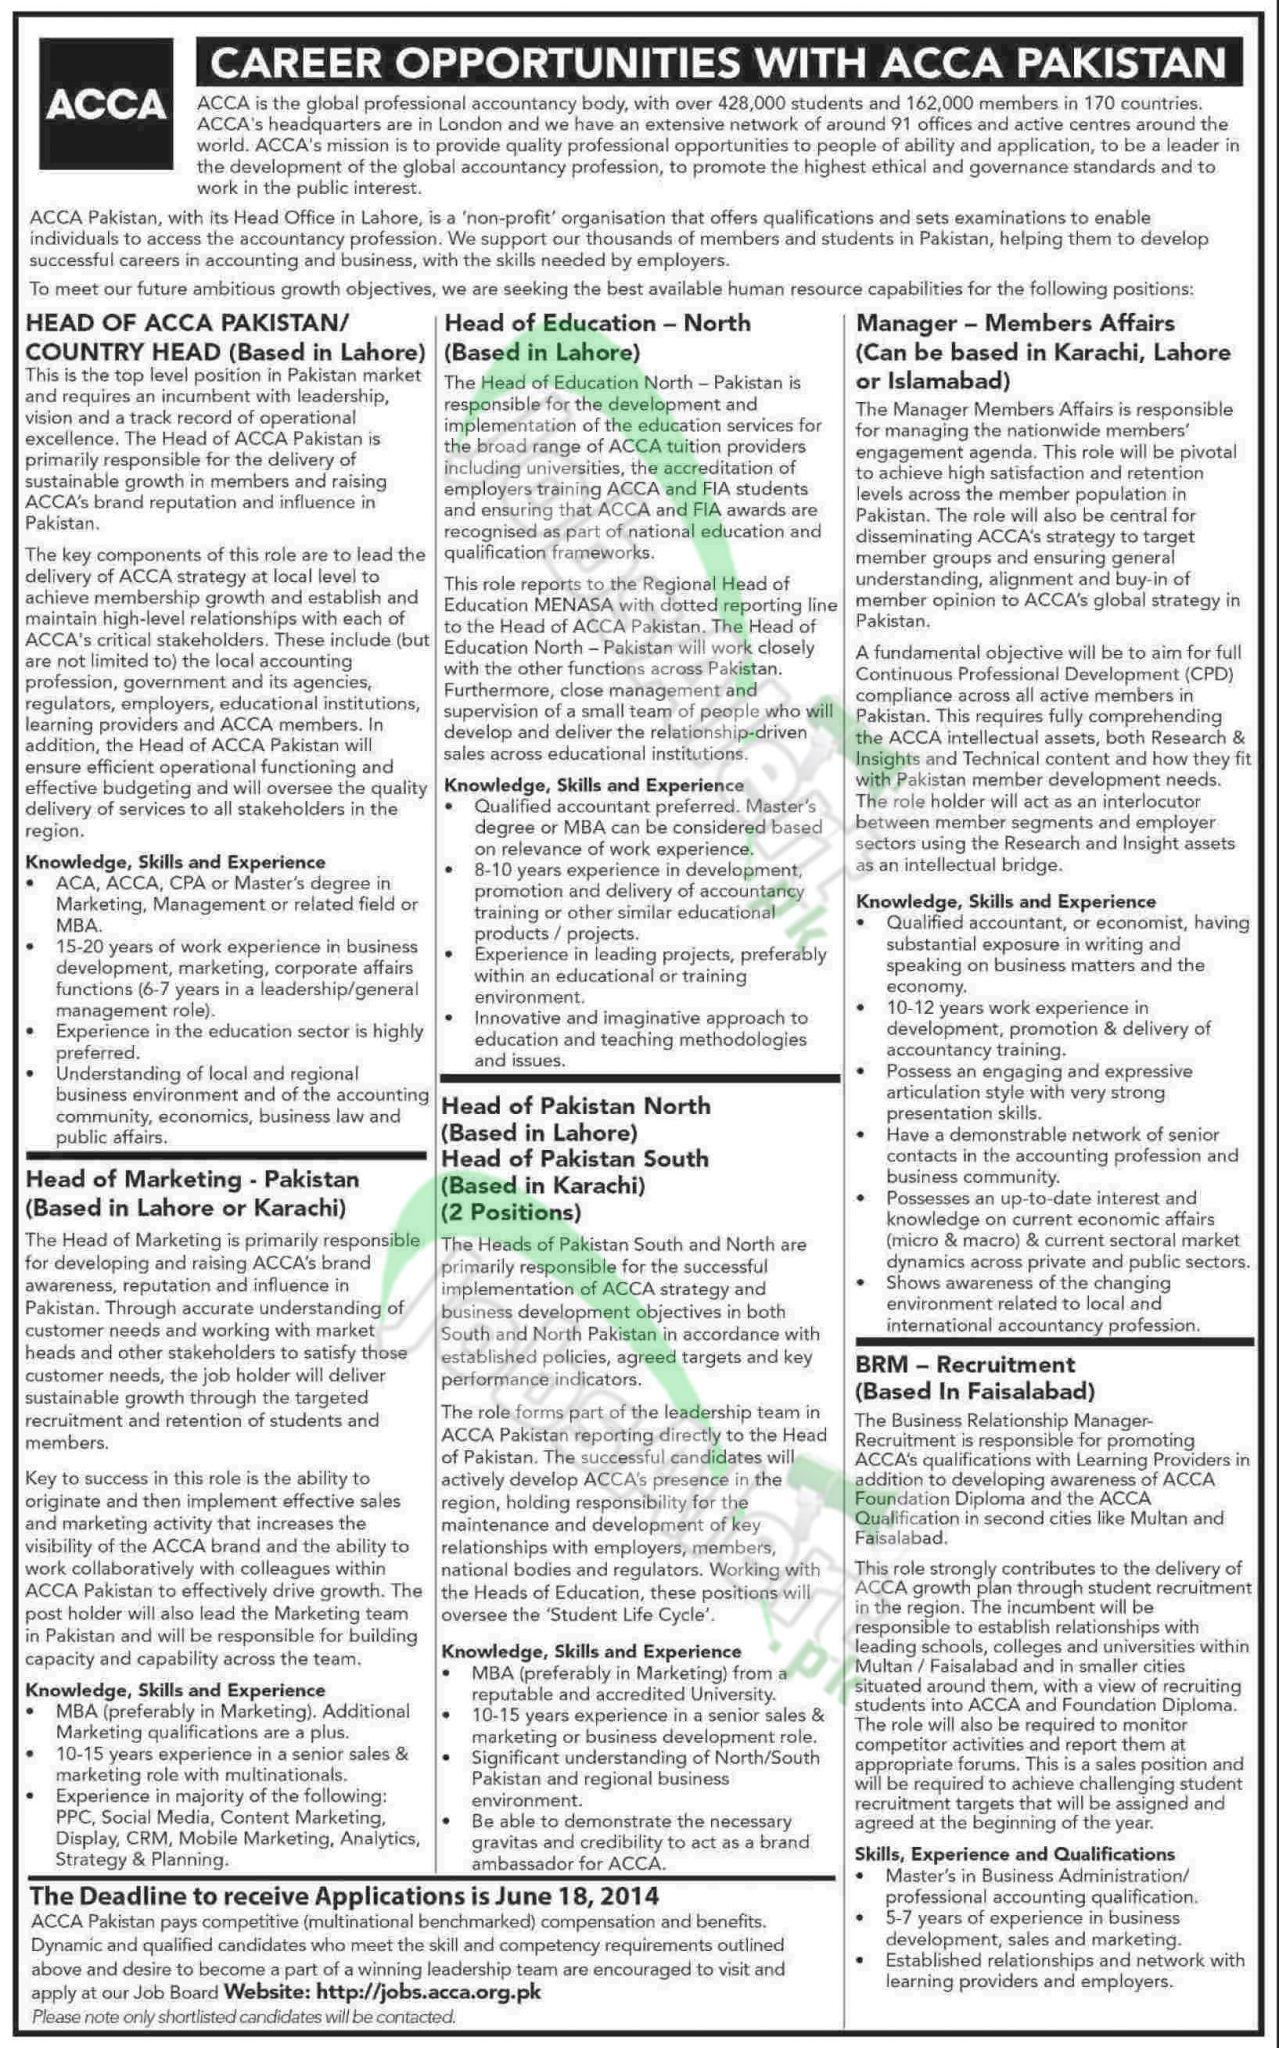 ACCA Pakistan